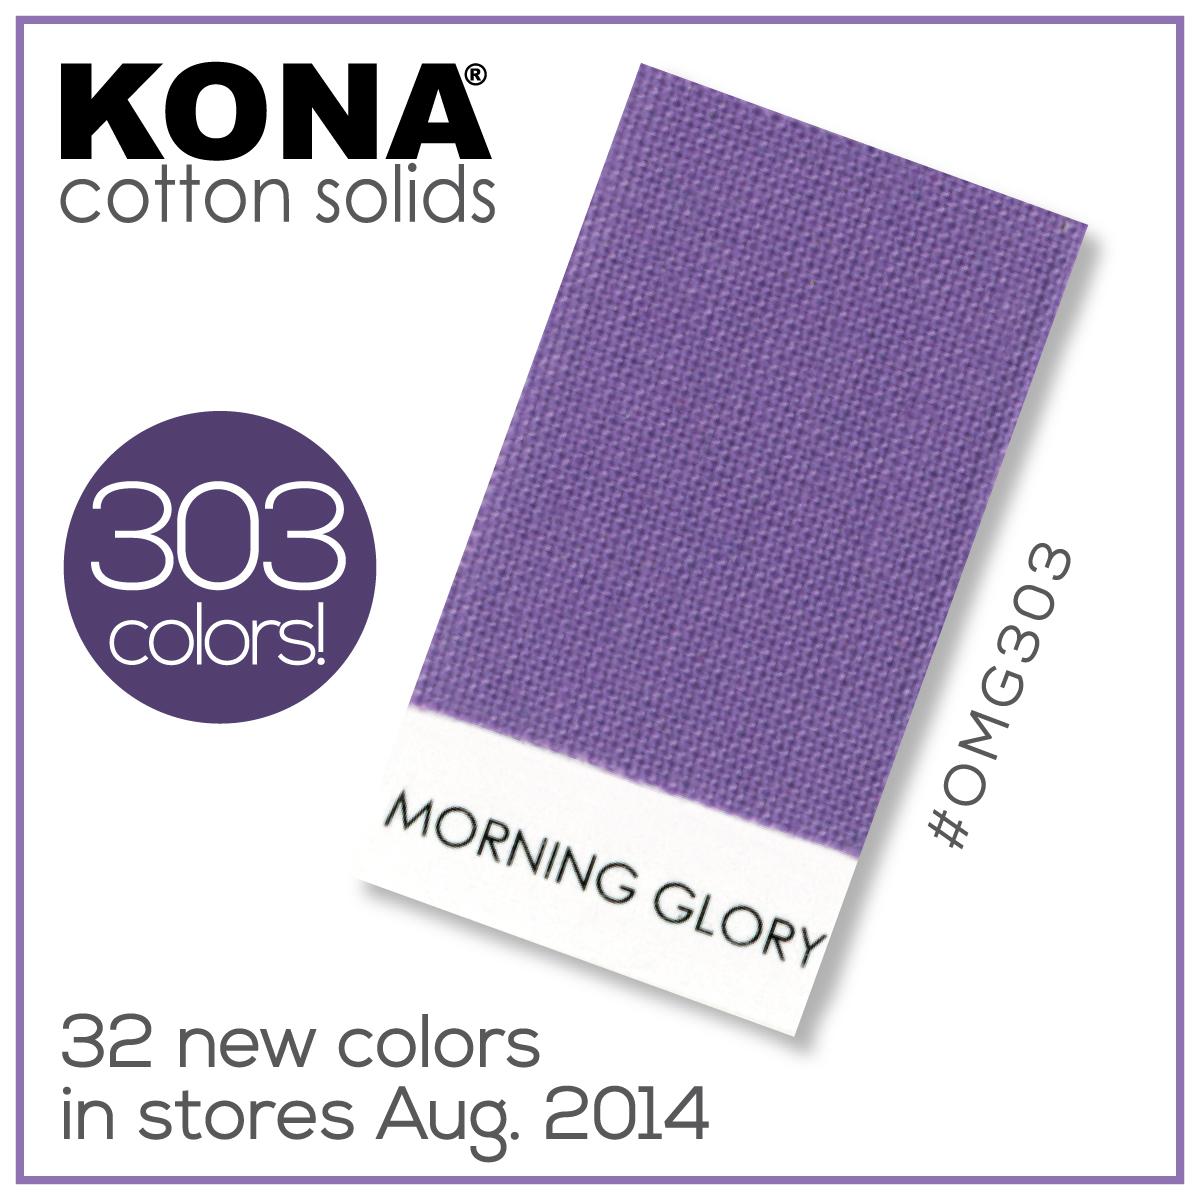 Kona-Morning-Glory.jpg